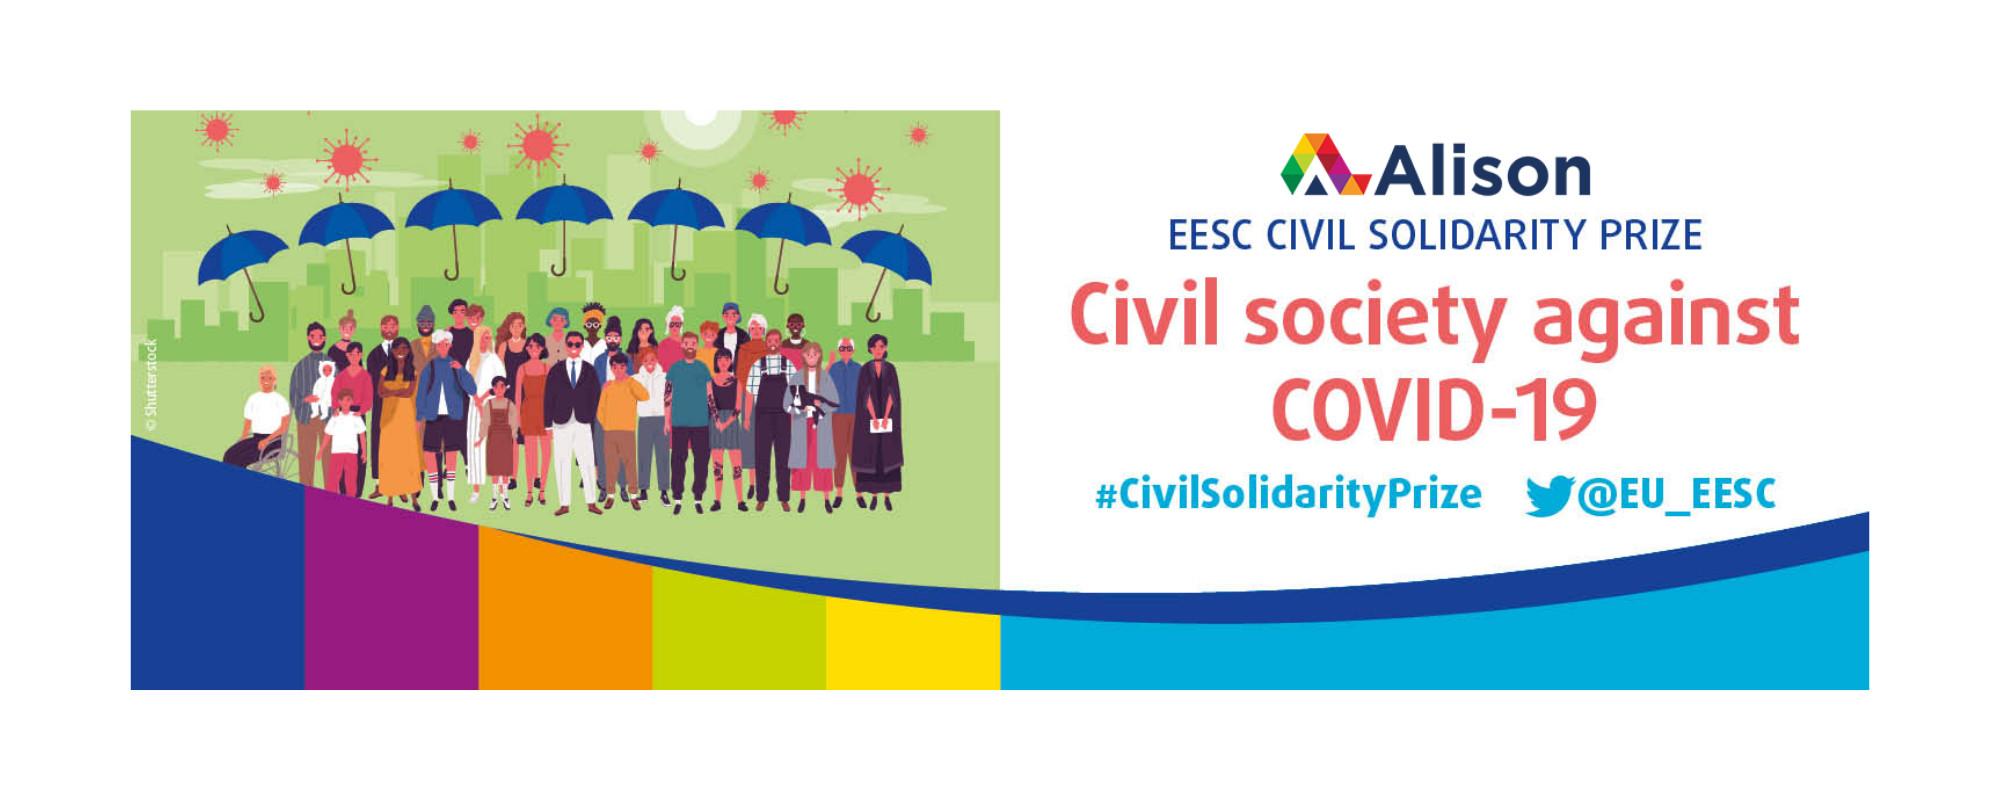 Alison Wins EU Civil Solidarity Prize